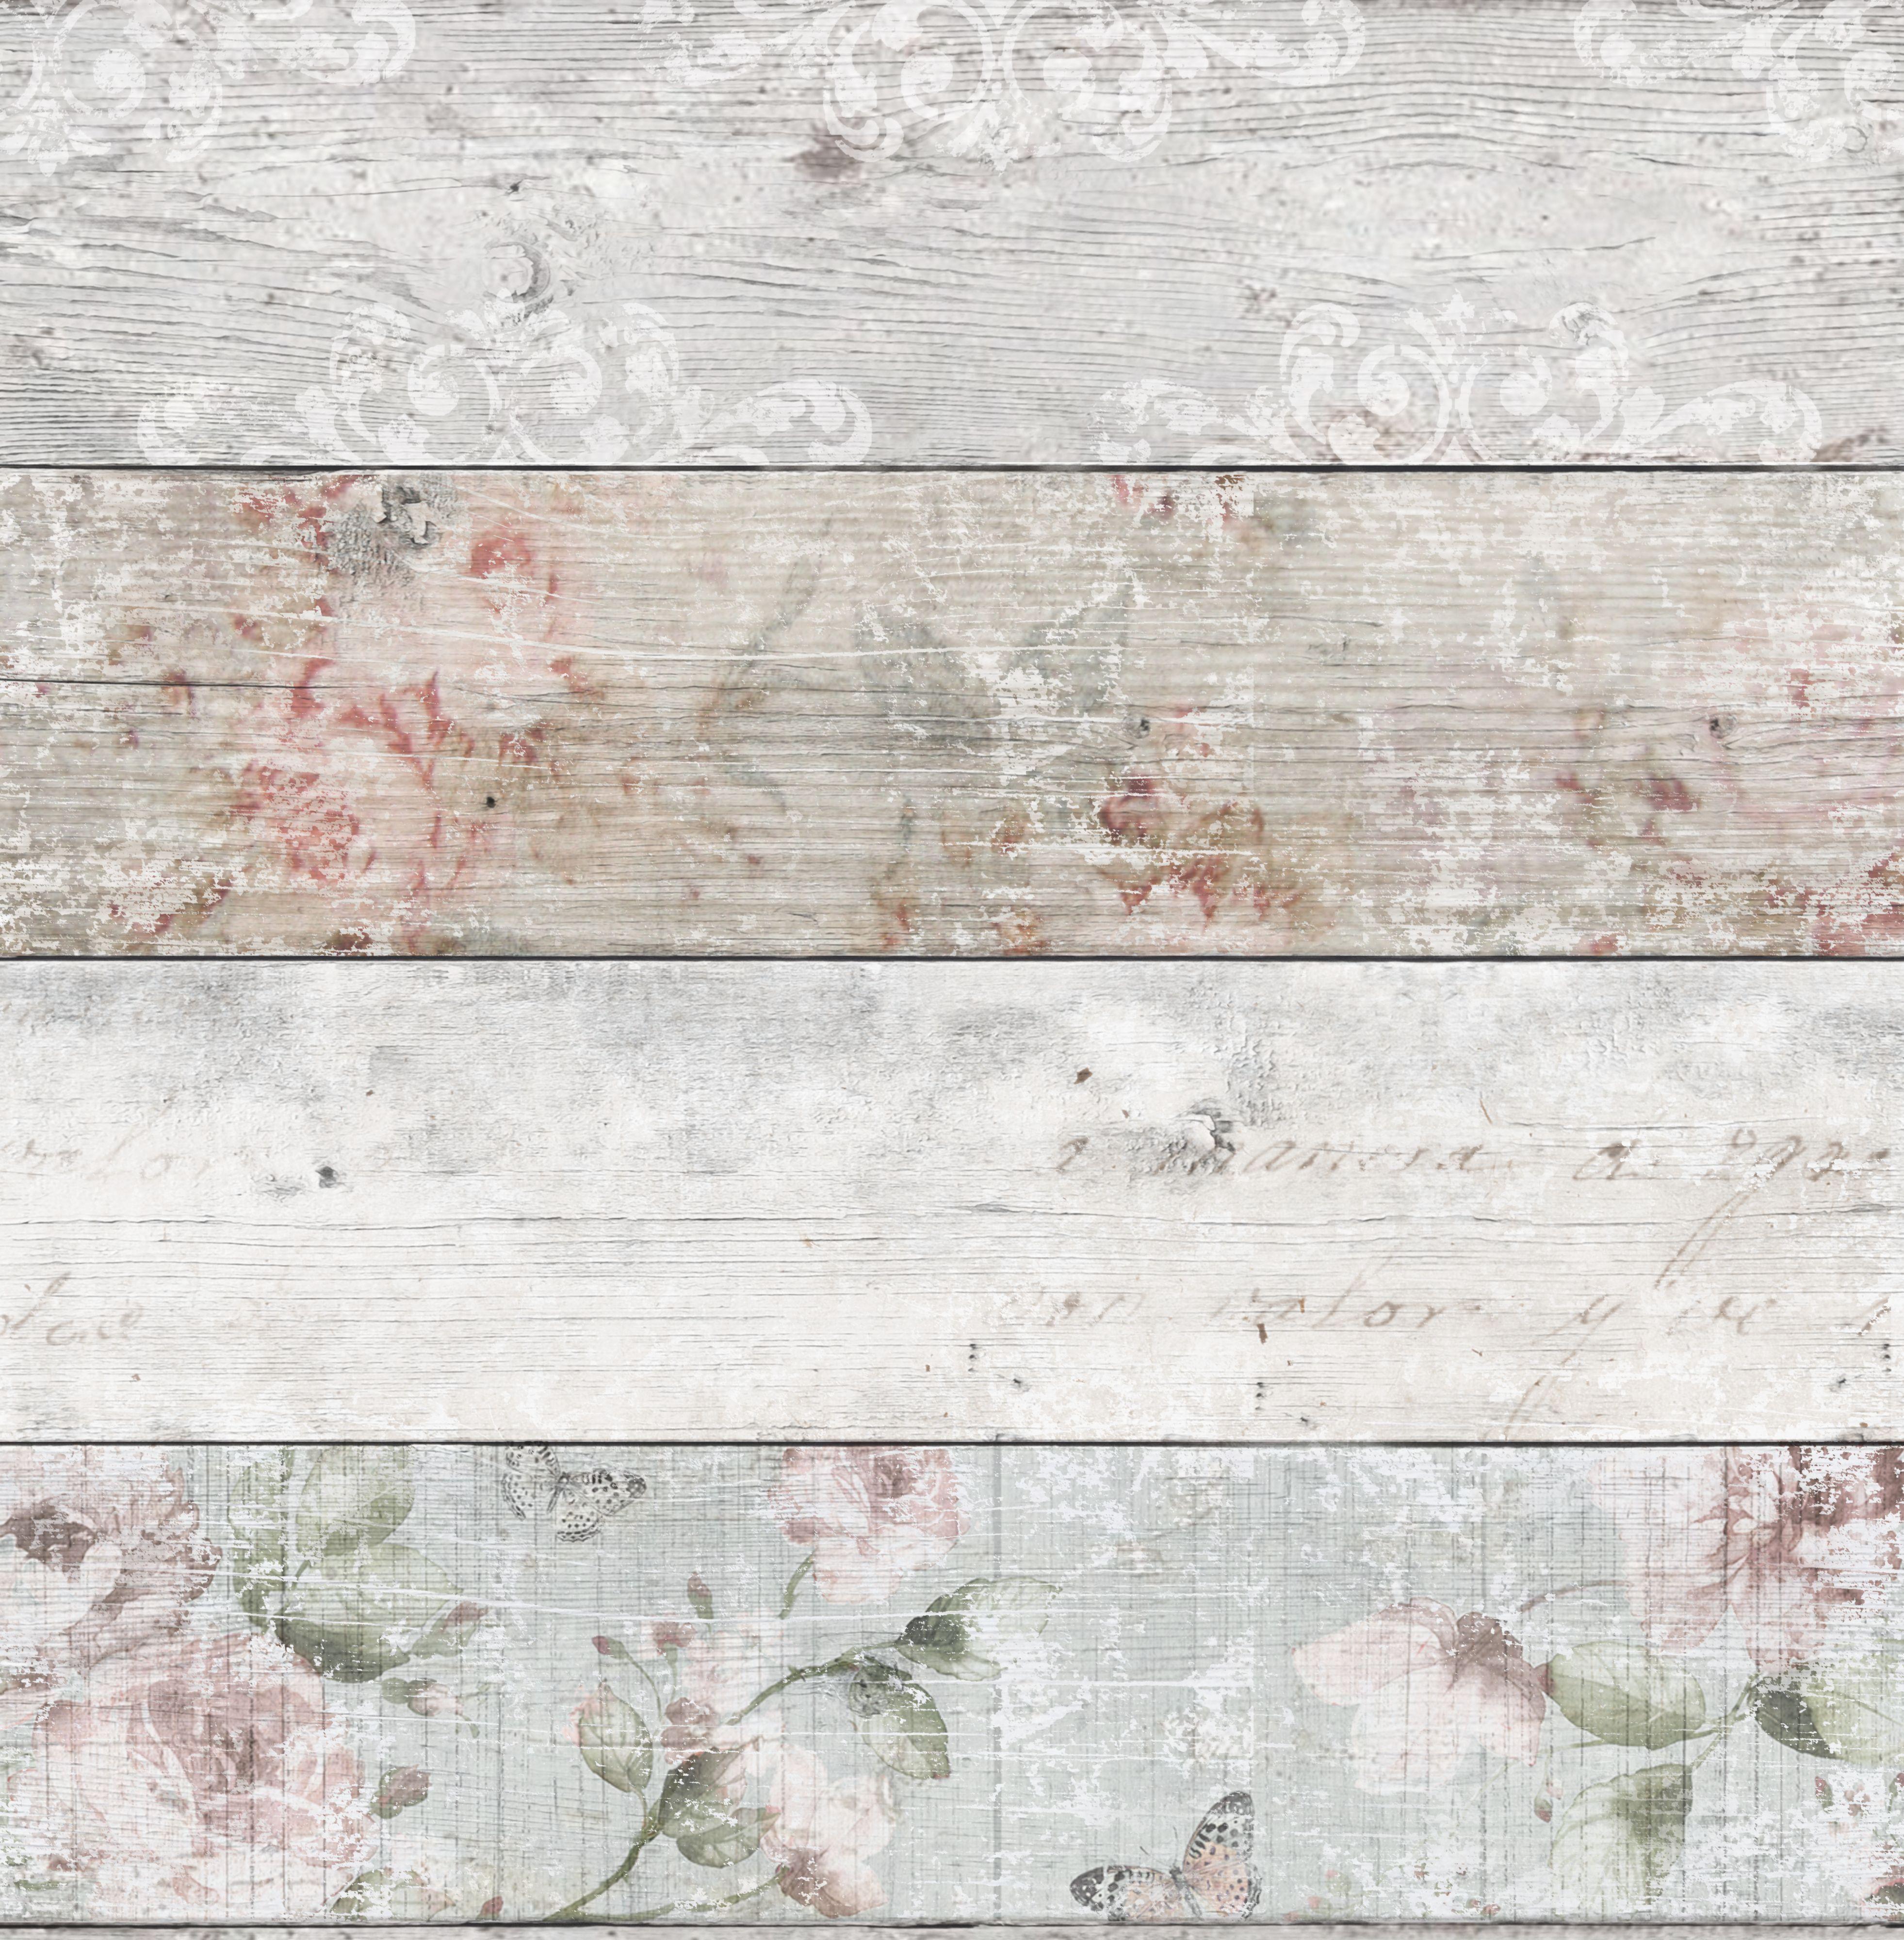 Graham & Brown Fresco Grey & Pink Distressed Floral Wood